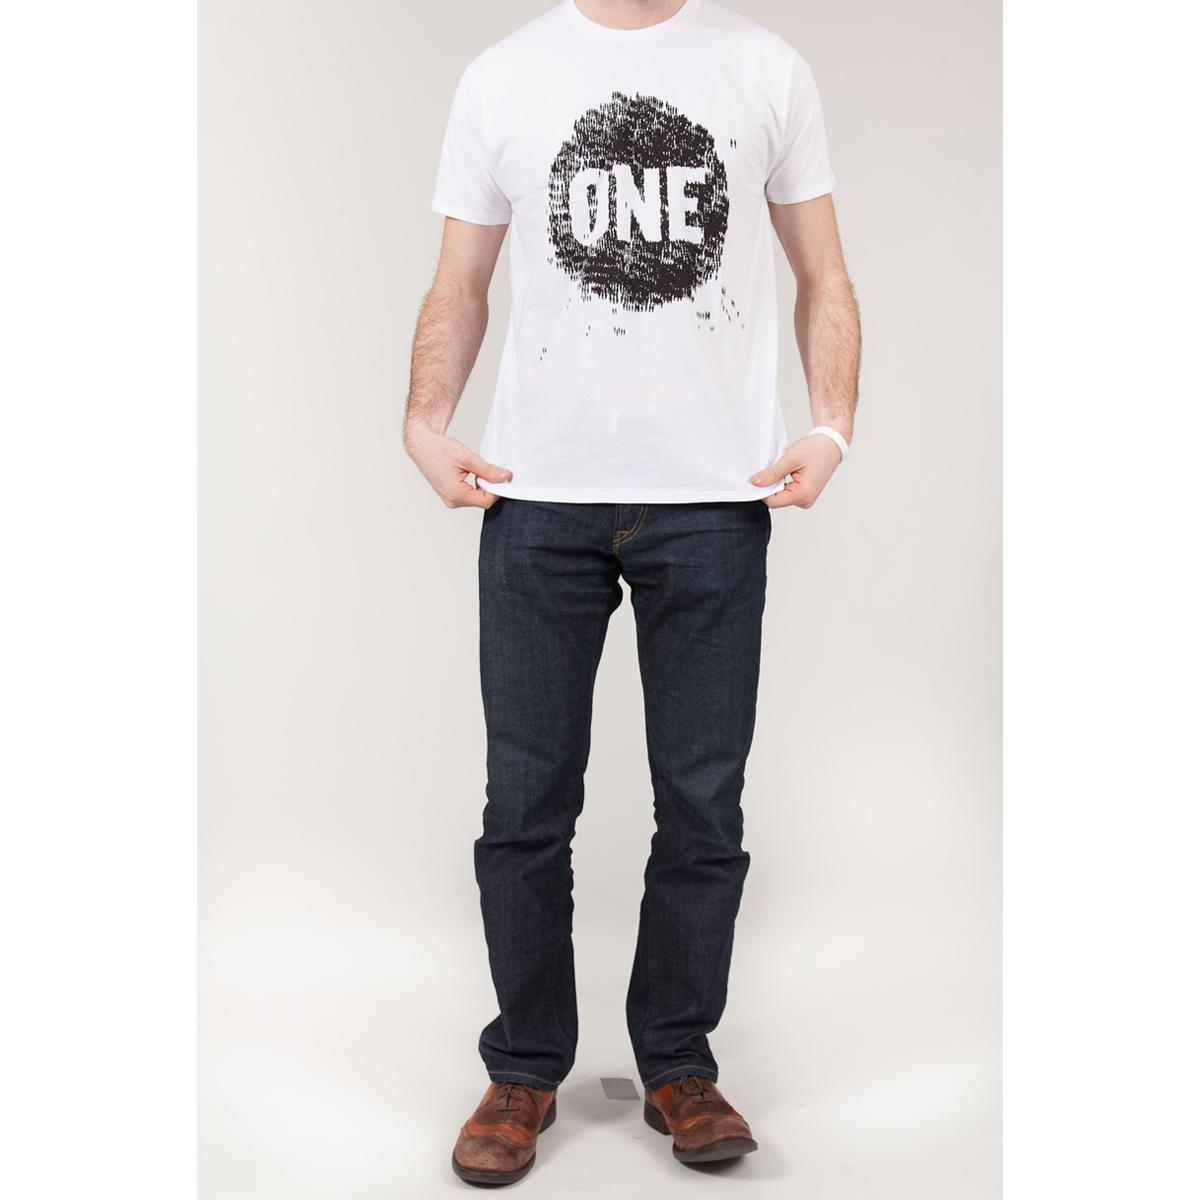 Men's ONE shirt by EDUN: United as ONE